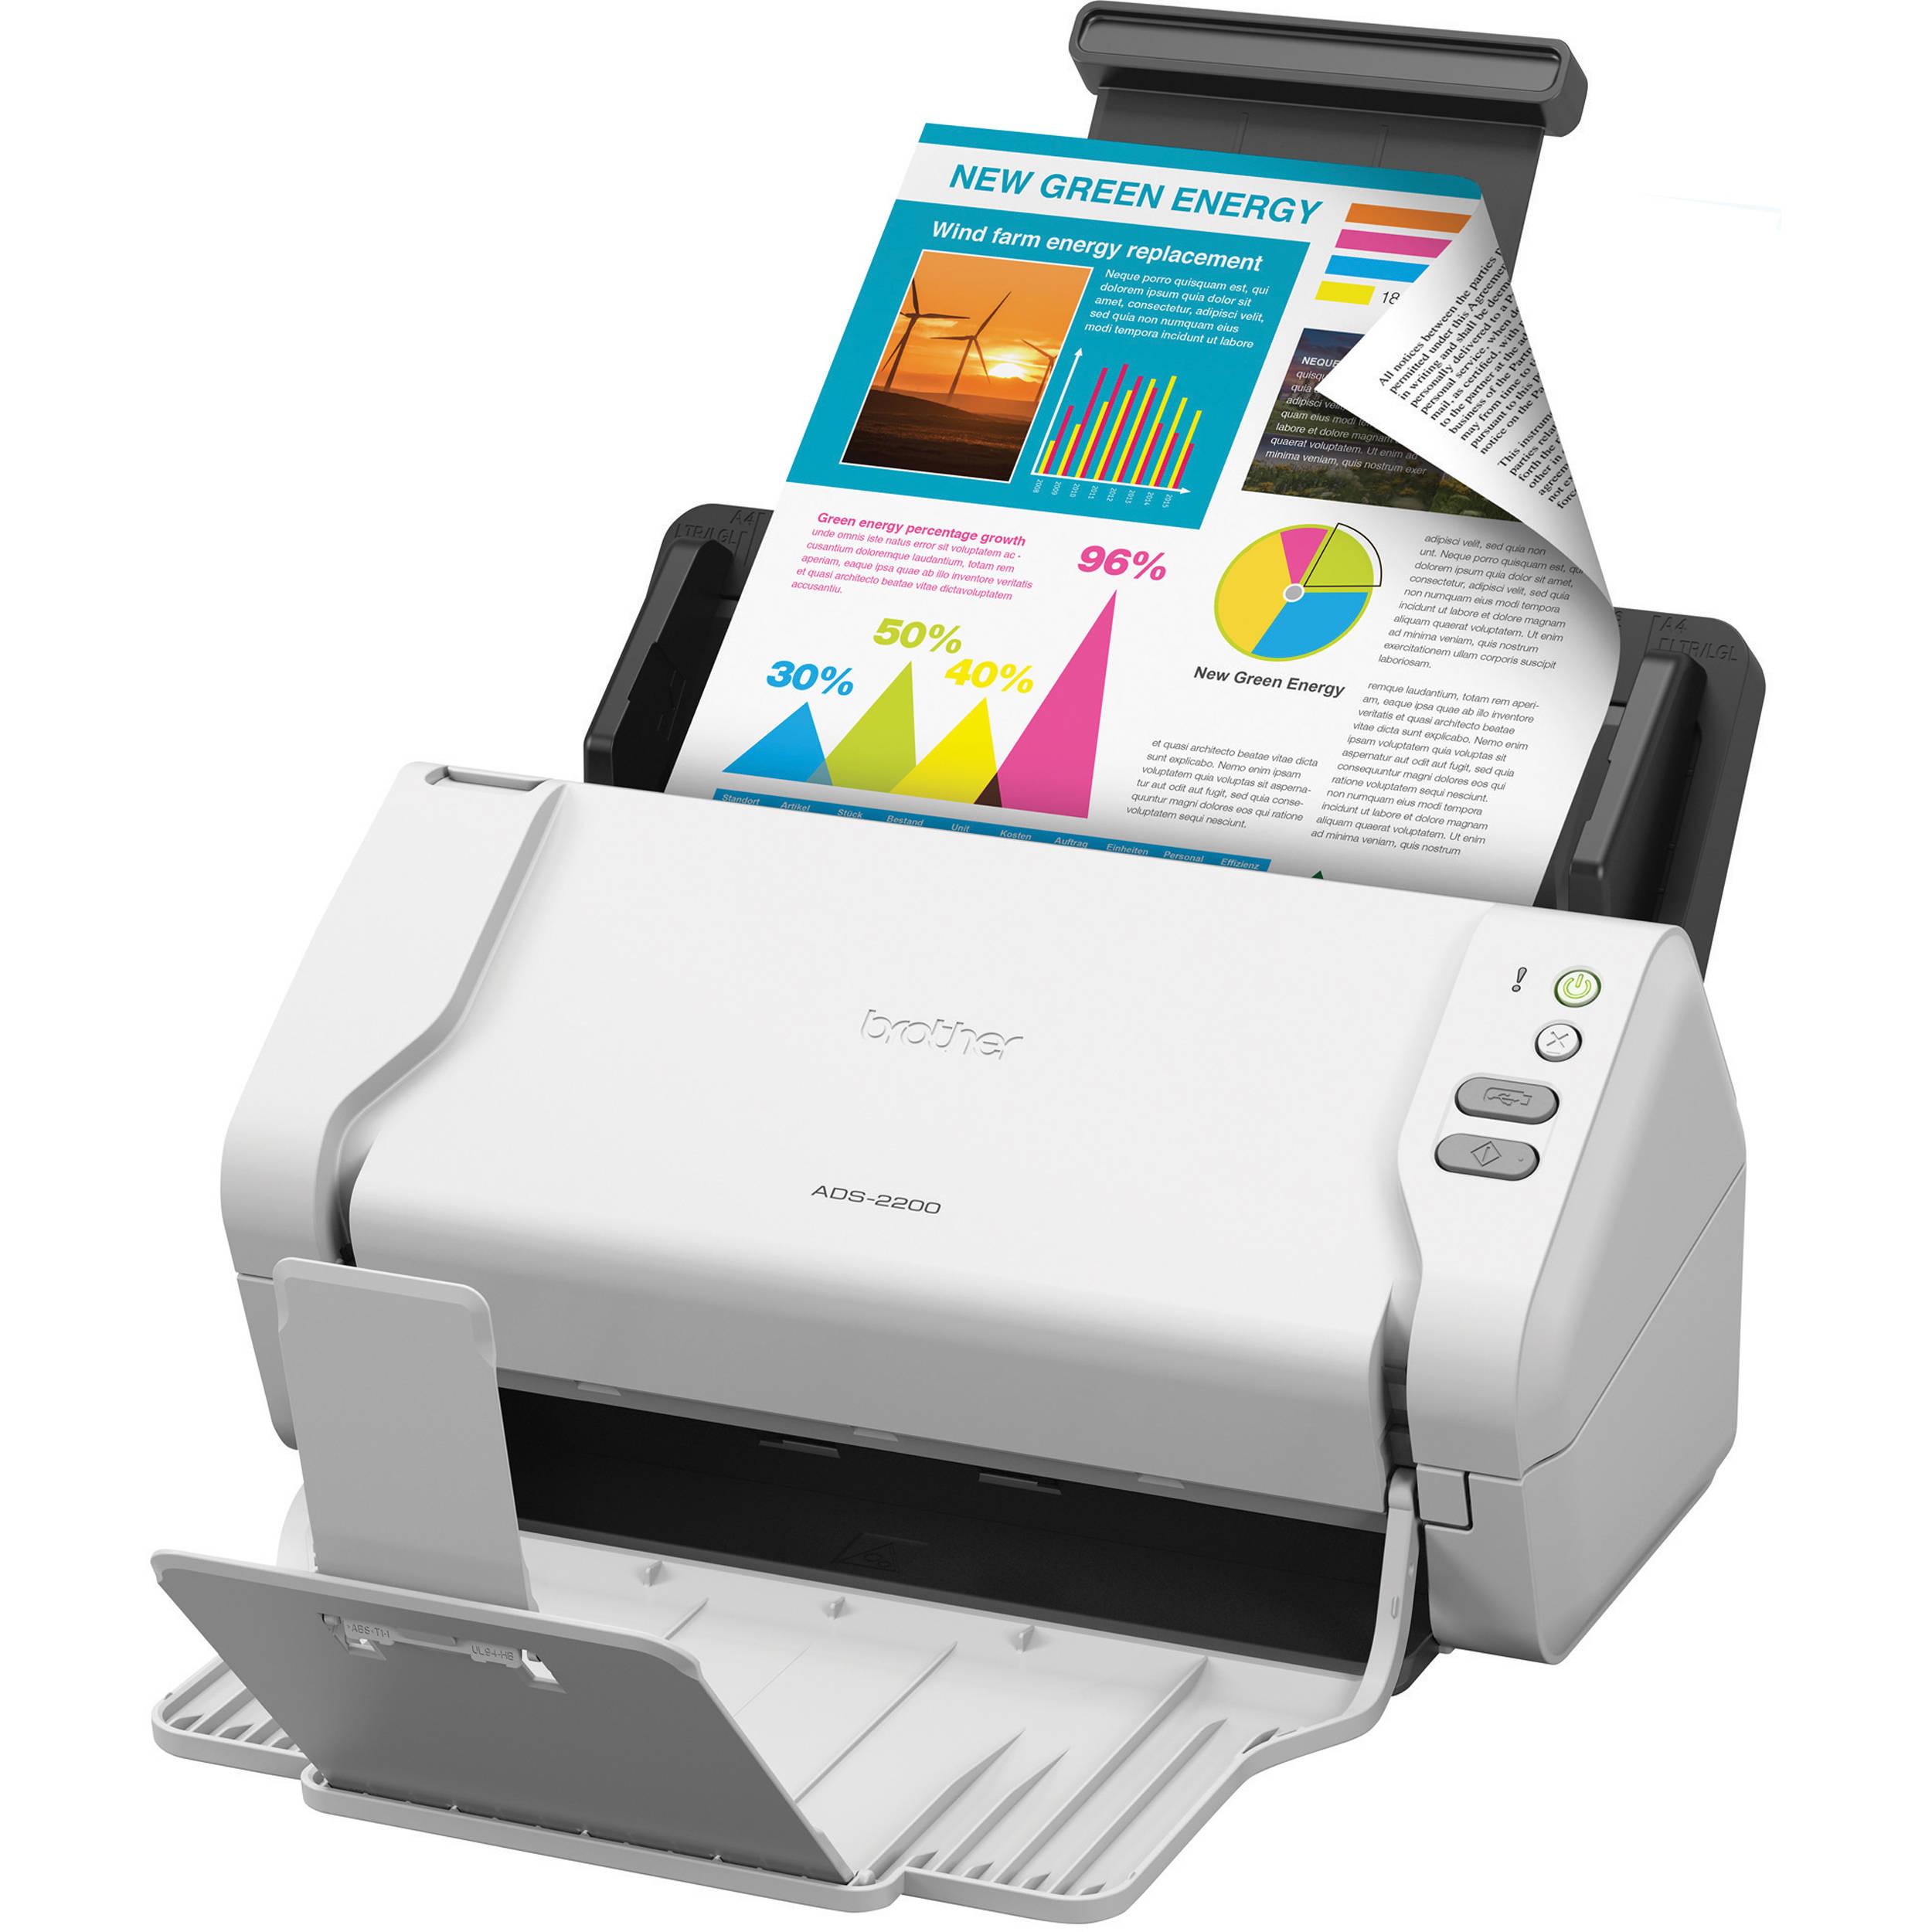 Duplex Scanning Brother High-Speed Desktop Document Scanner ADS-2200 Multiple Scan Destinations